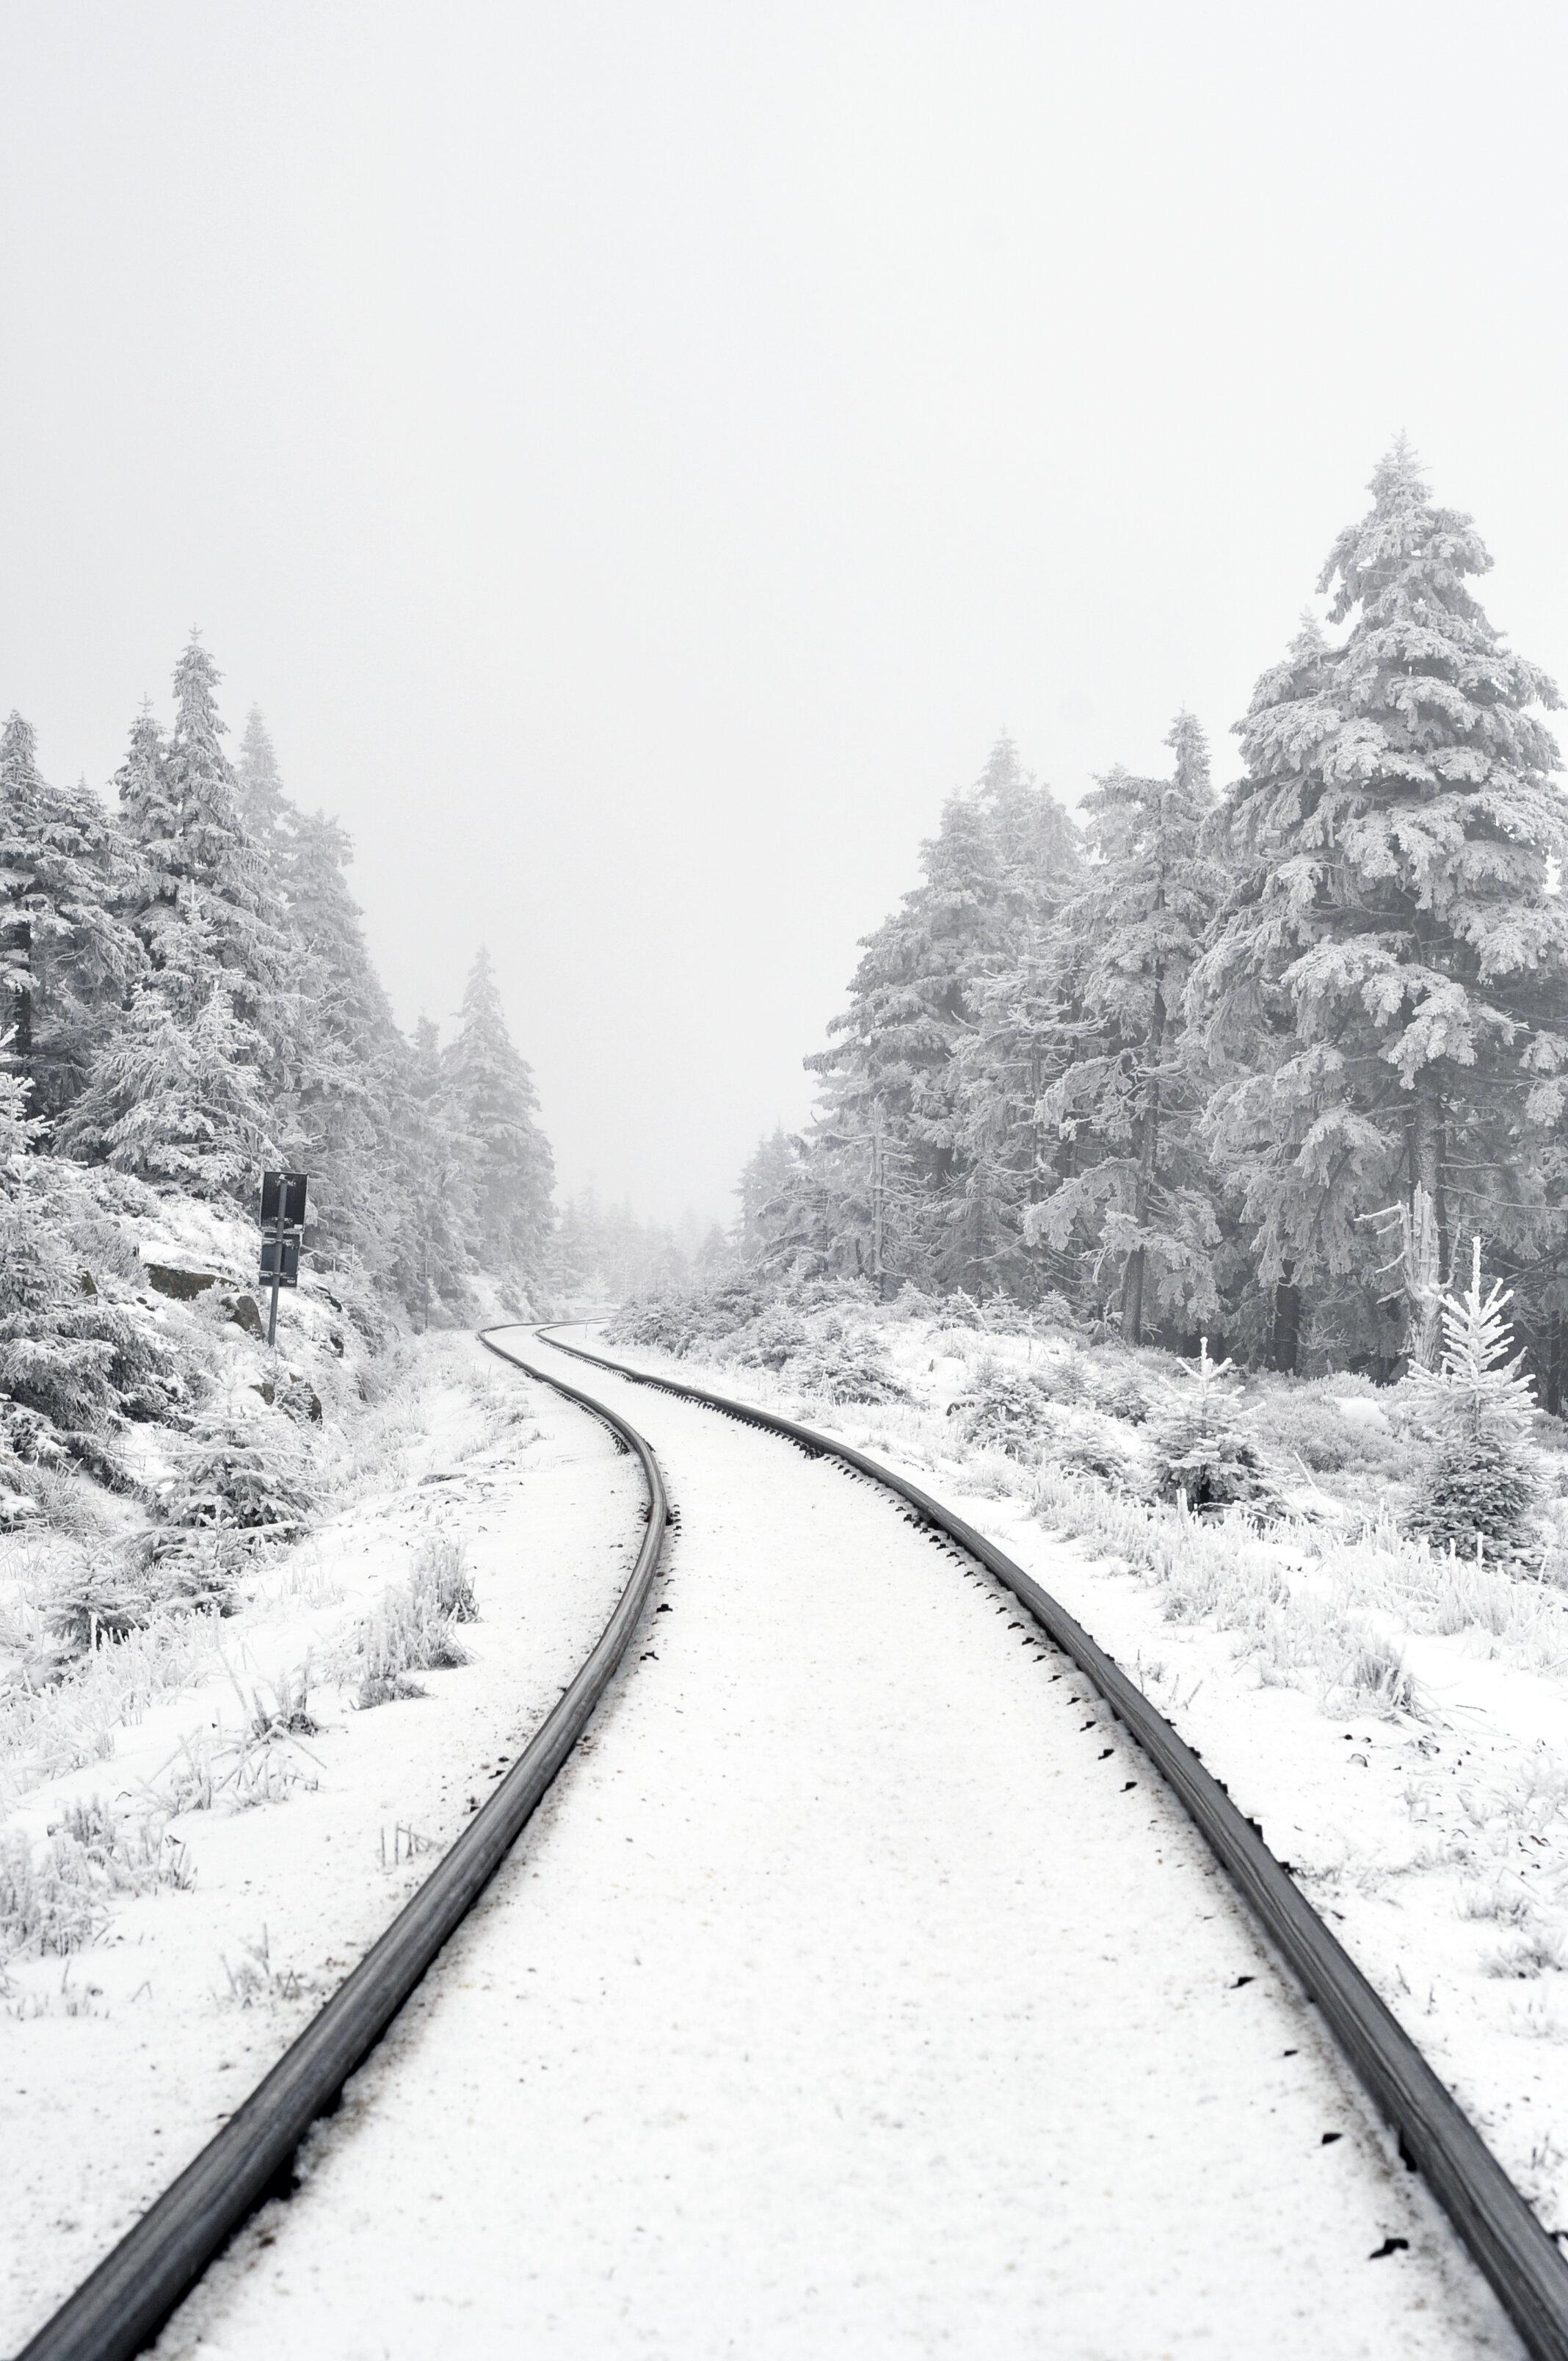 Unsplash Winter Snow Image